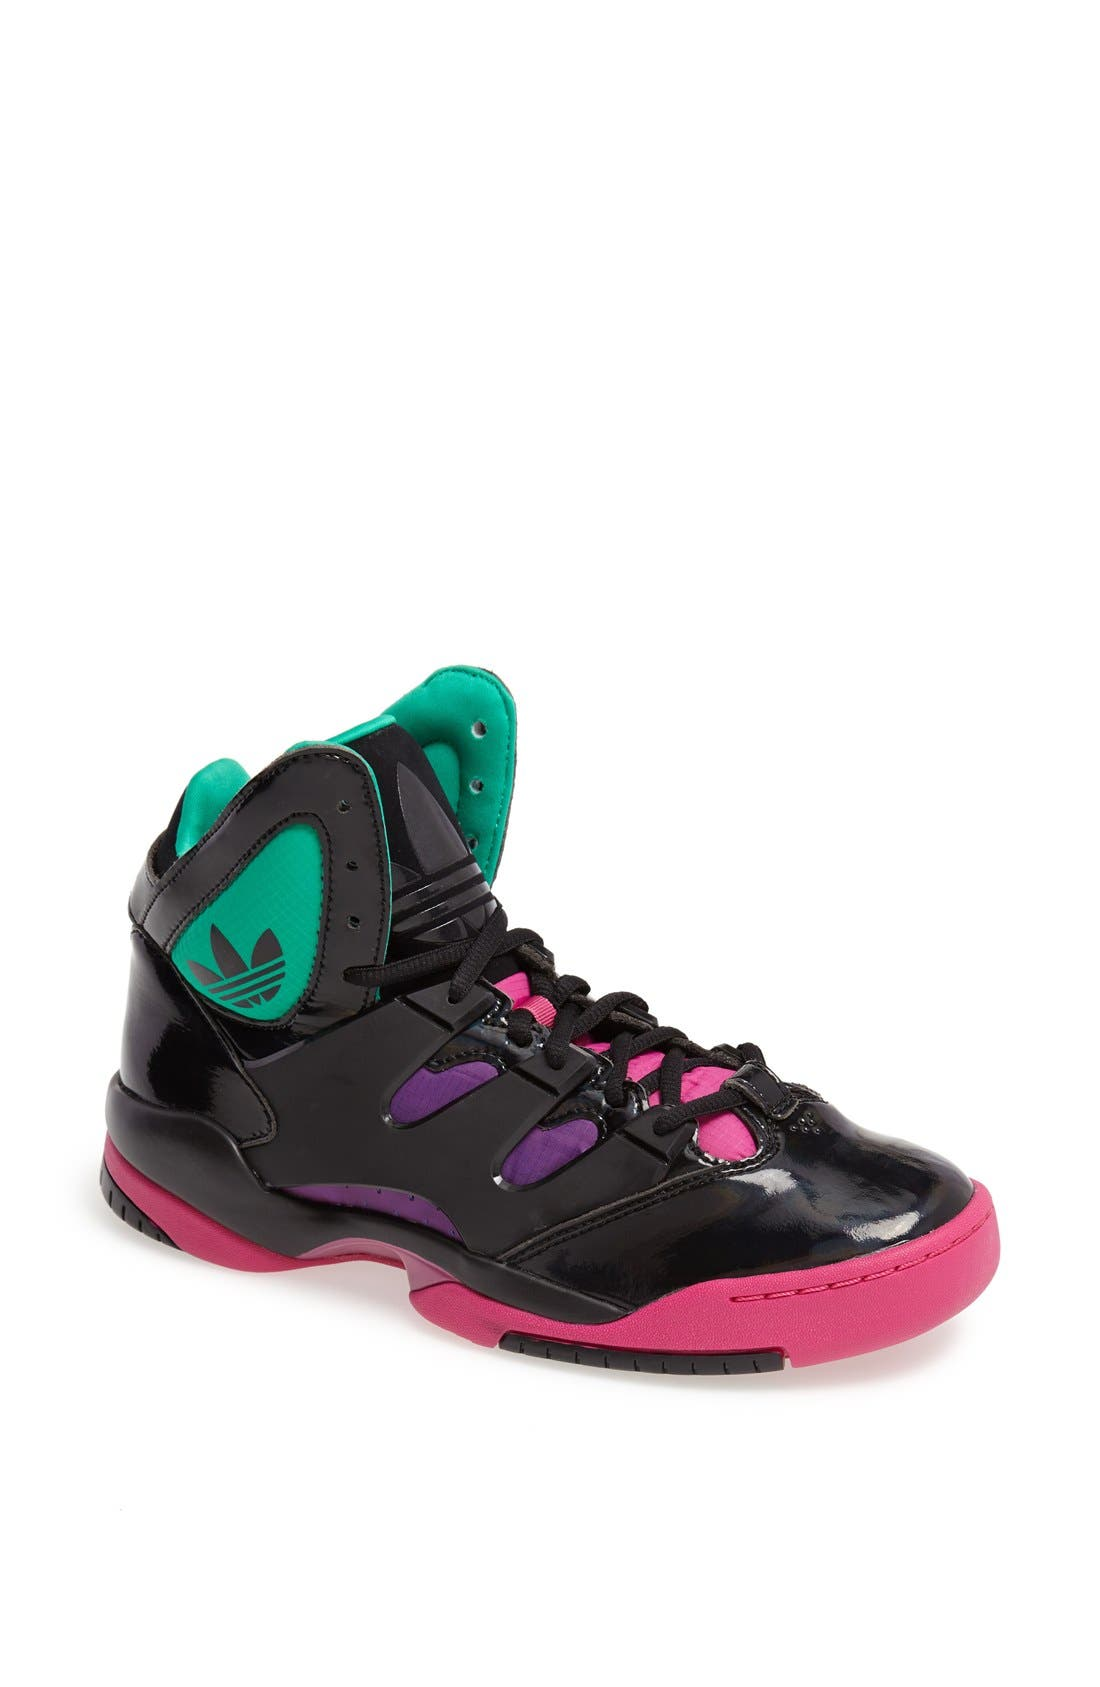 Alternate Image 1 Selected - adidas 'GLC' sneaker (Women)